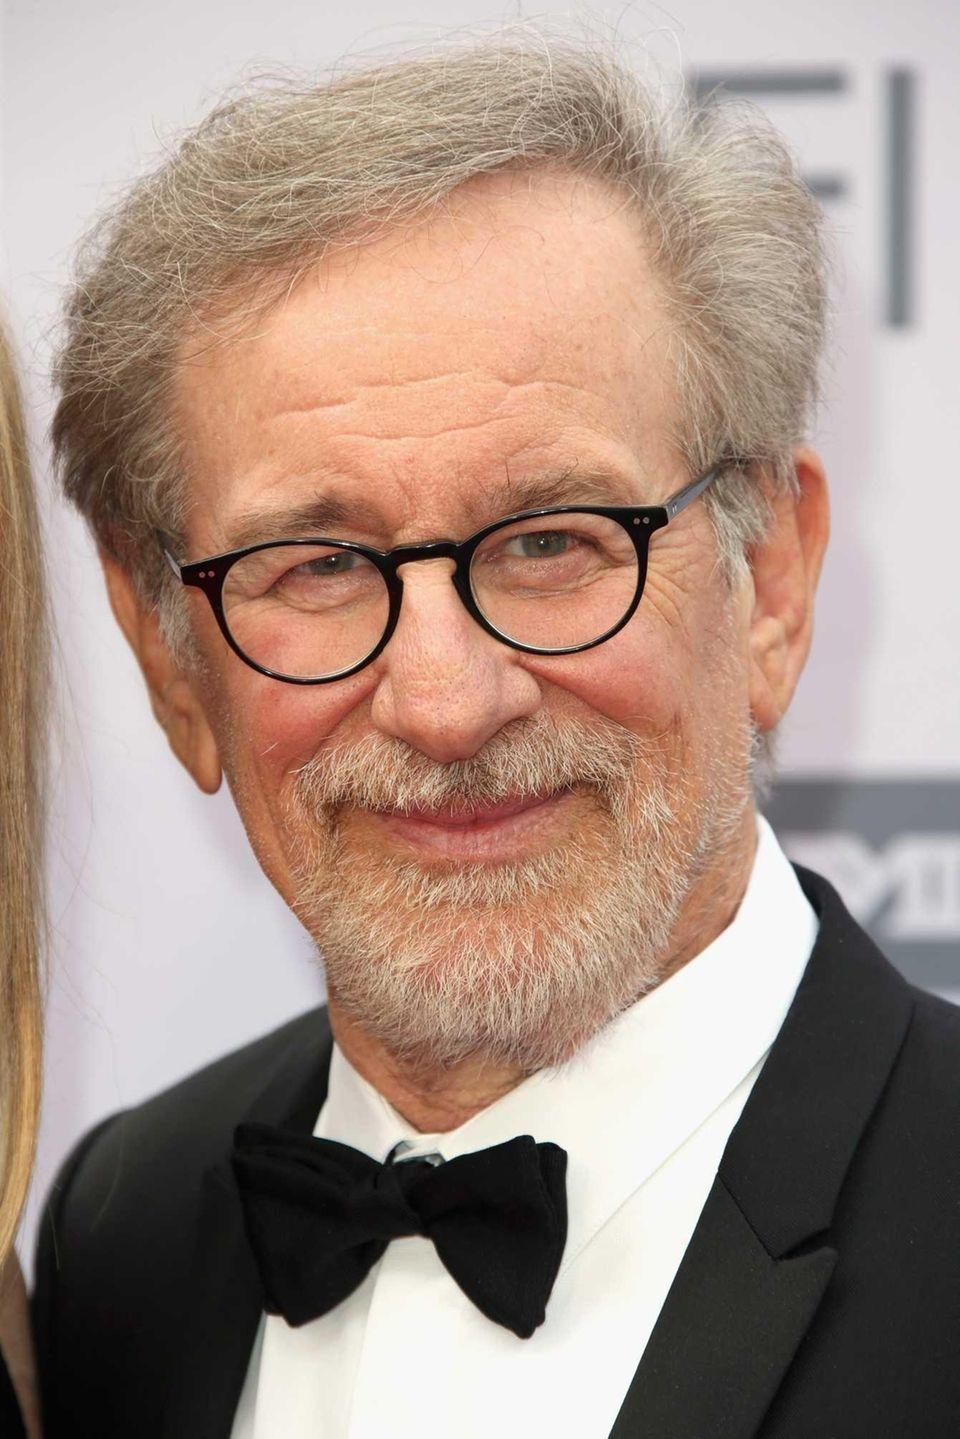 Director Steven Spielberg has donated big money to